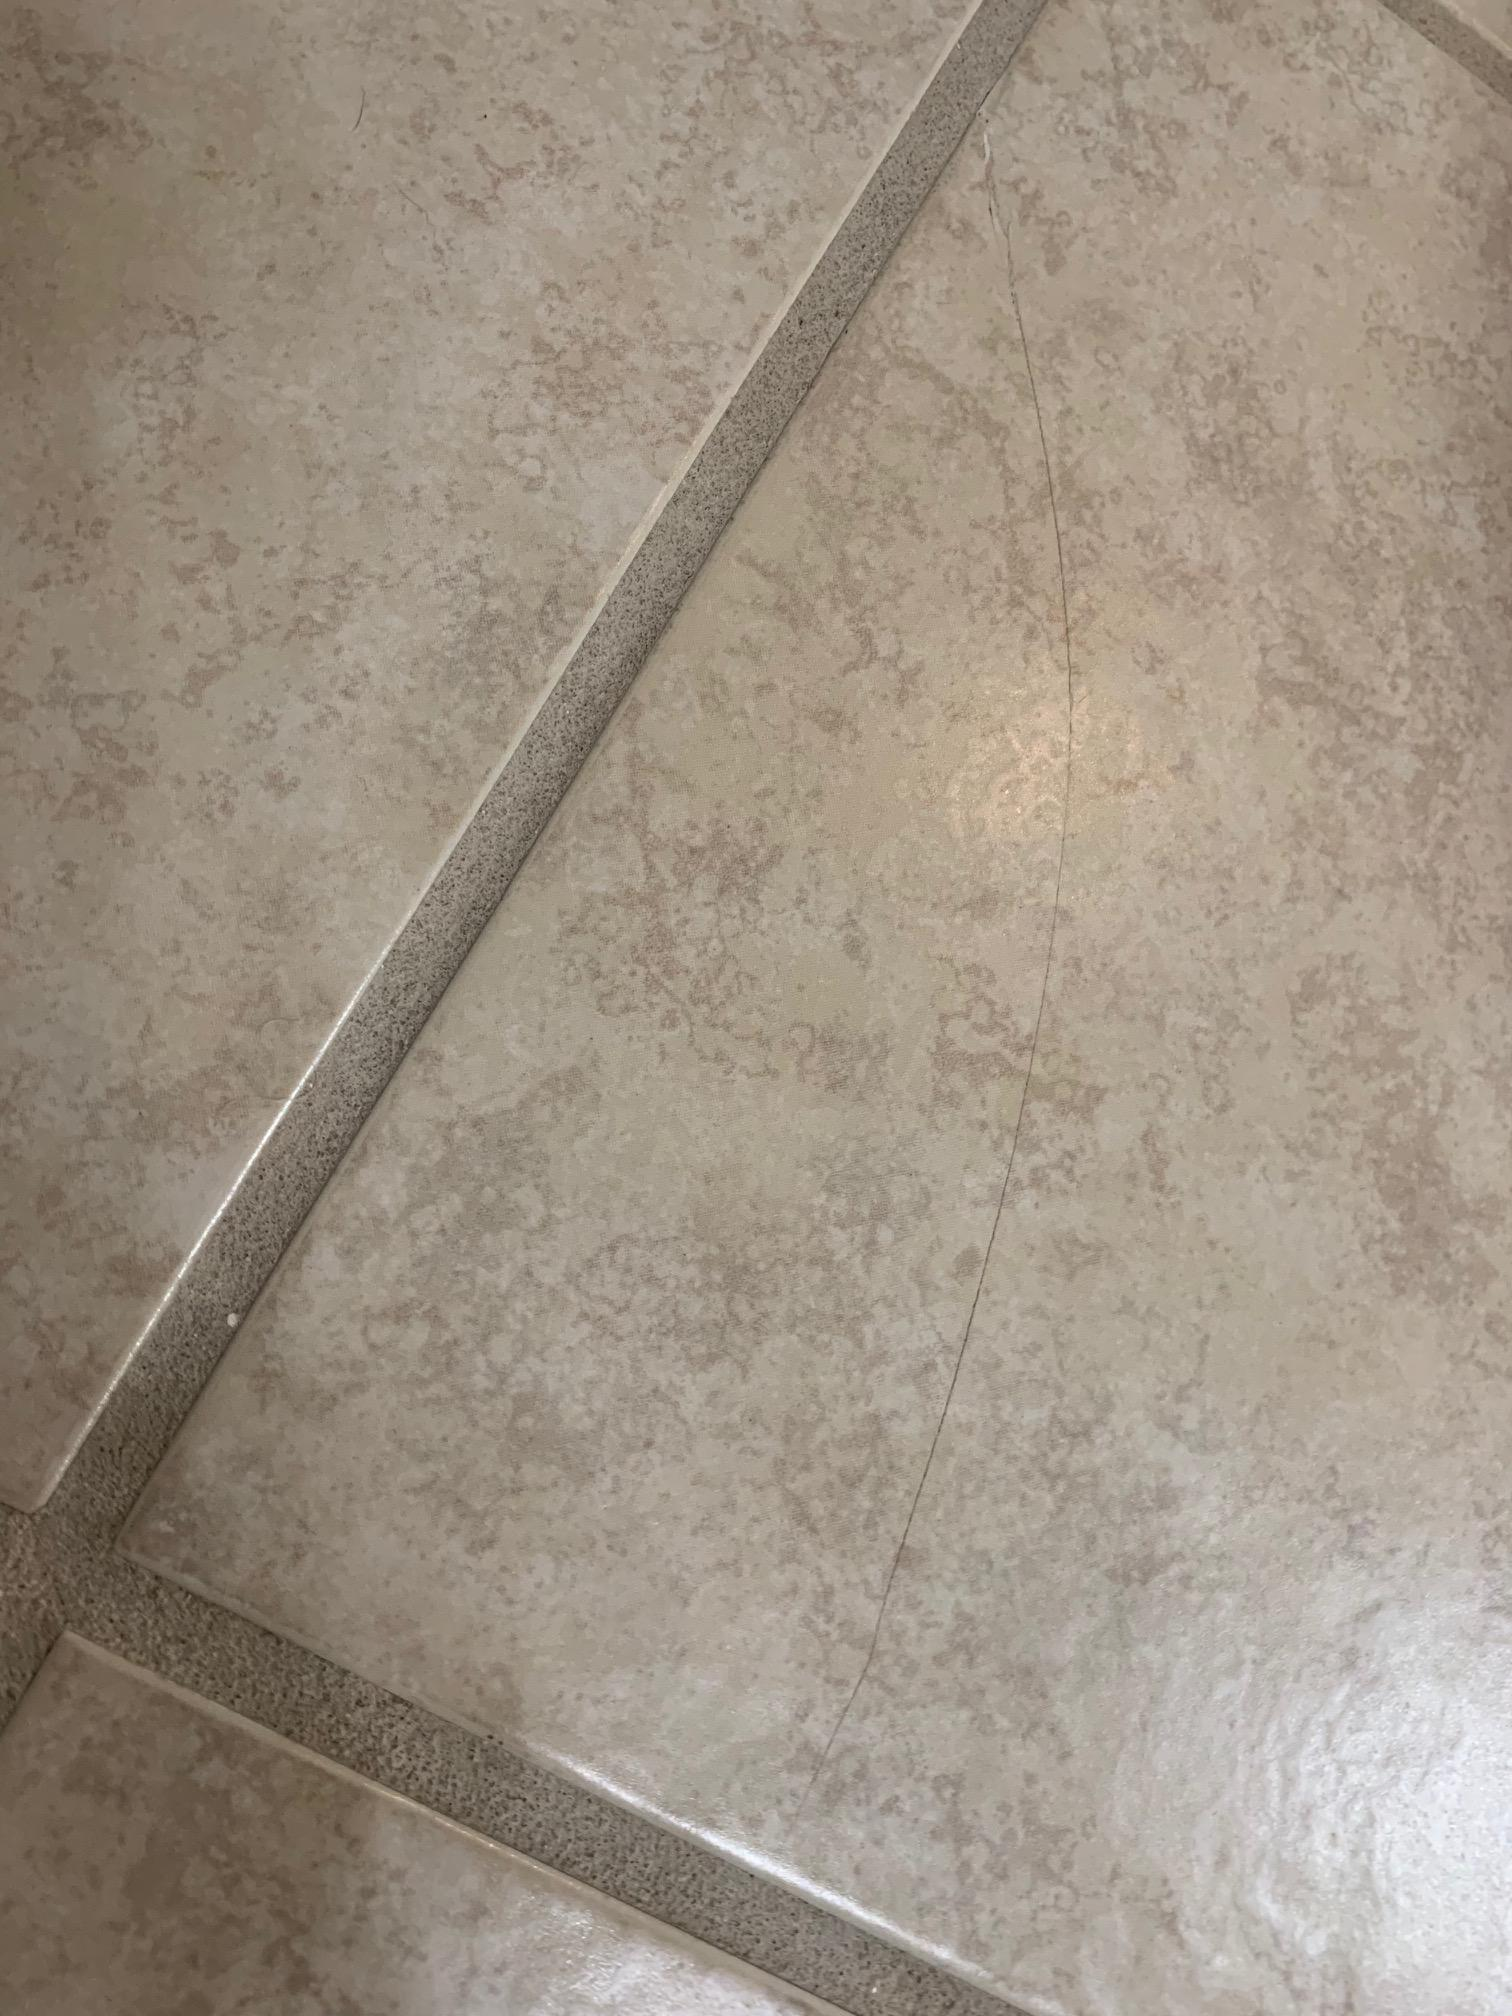 hairline crack in floor tile